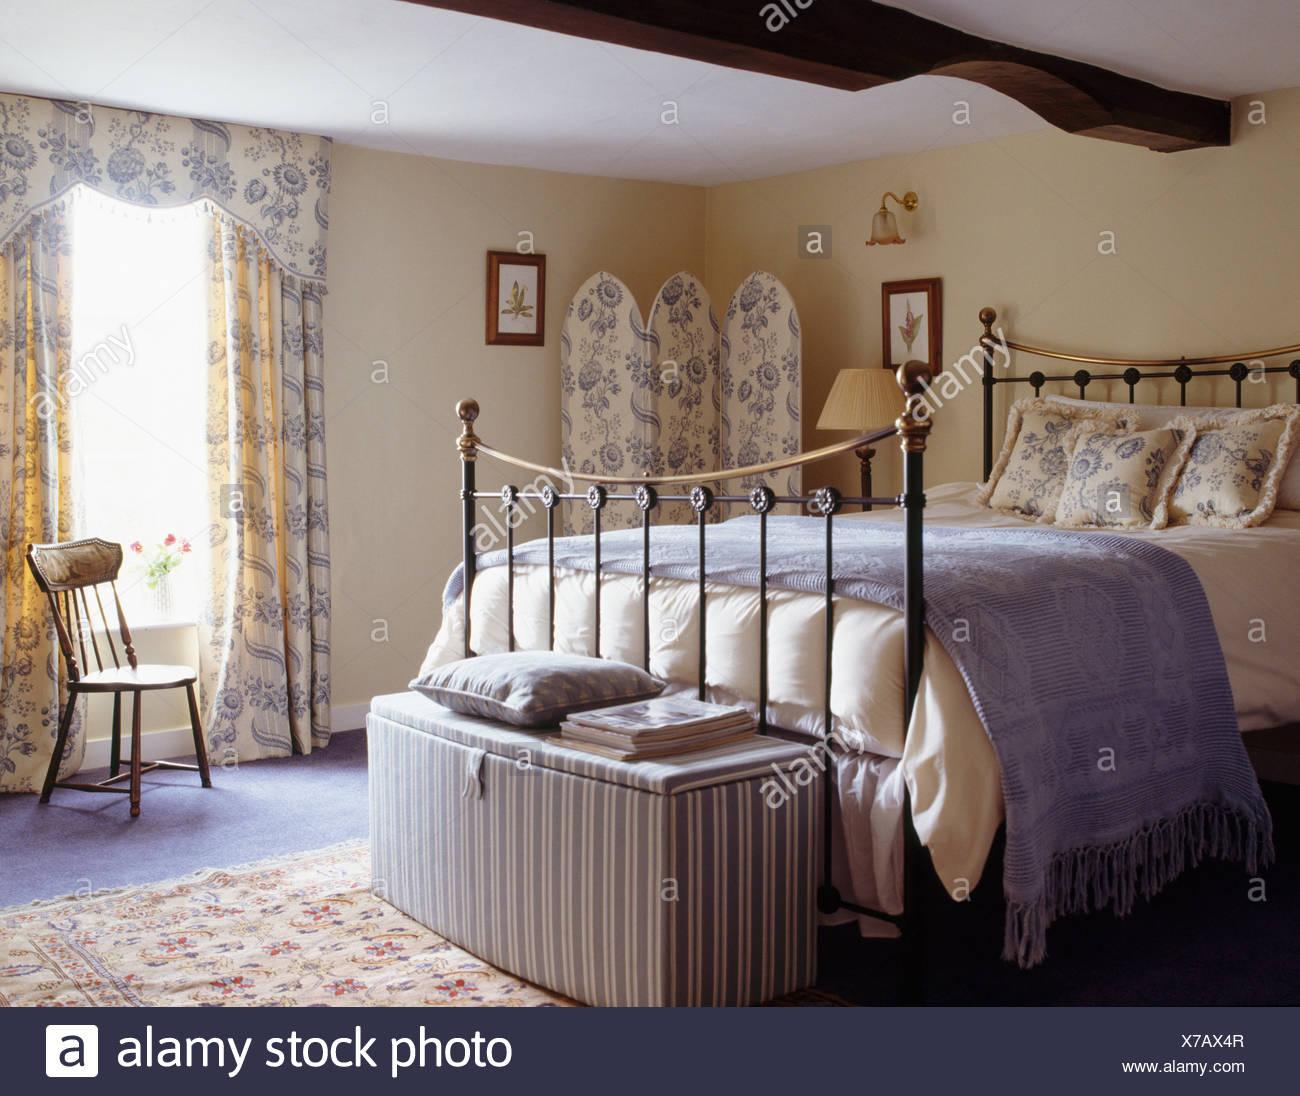 Bed Blue Toile De Jouy Stockfotos & Bed Blue Toile De Jouy Bilder ...